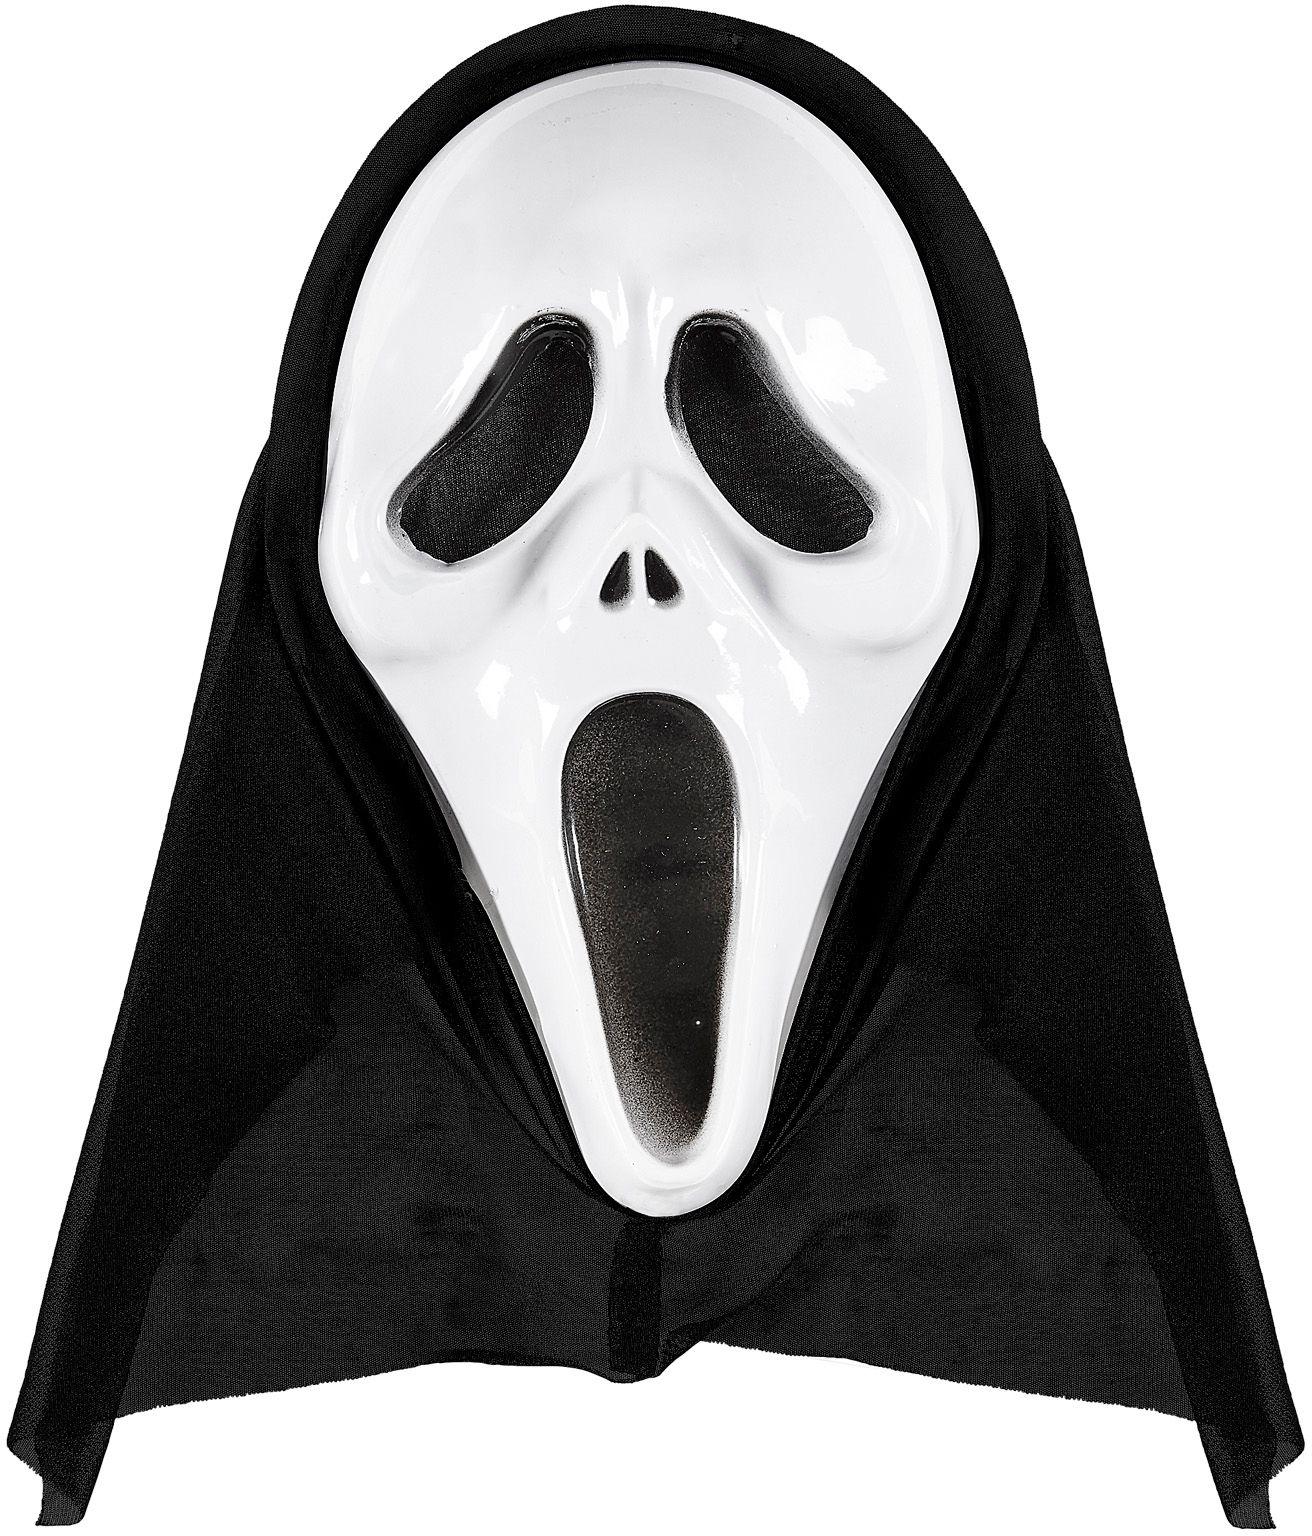 Wit scream masker